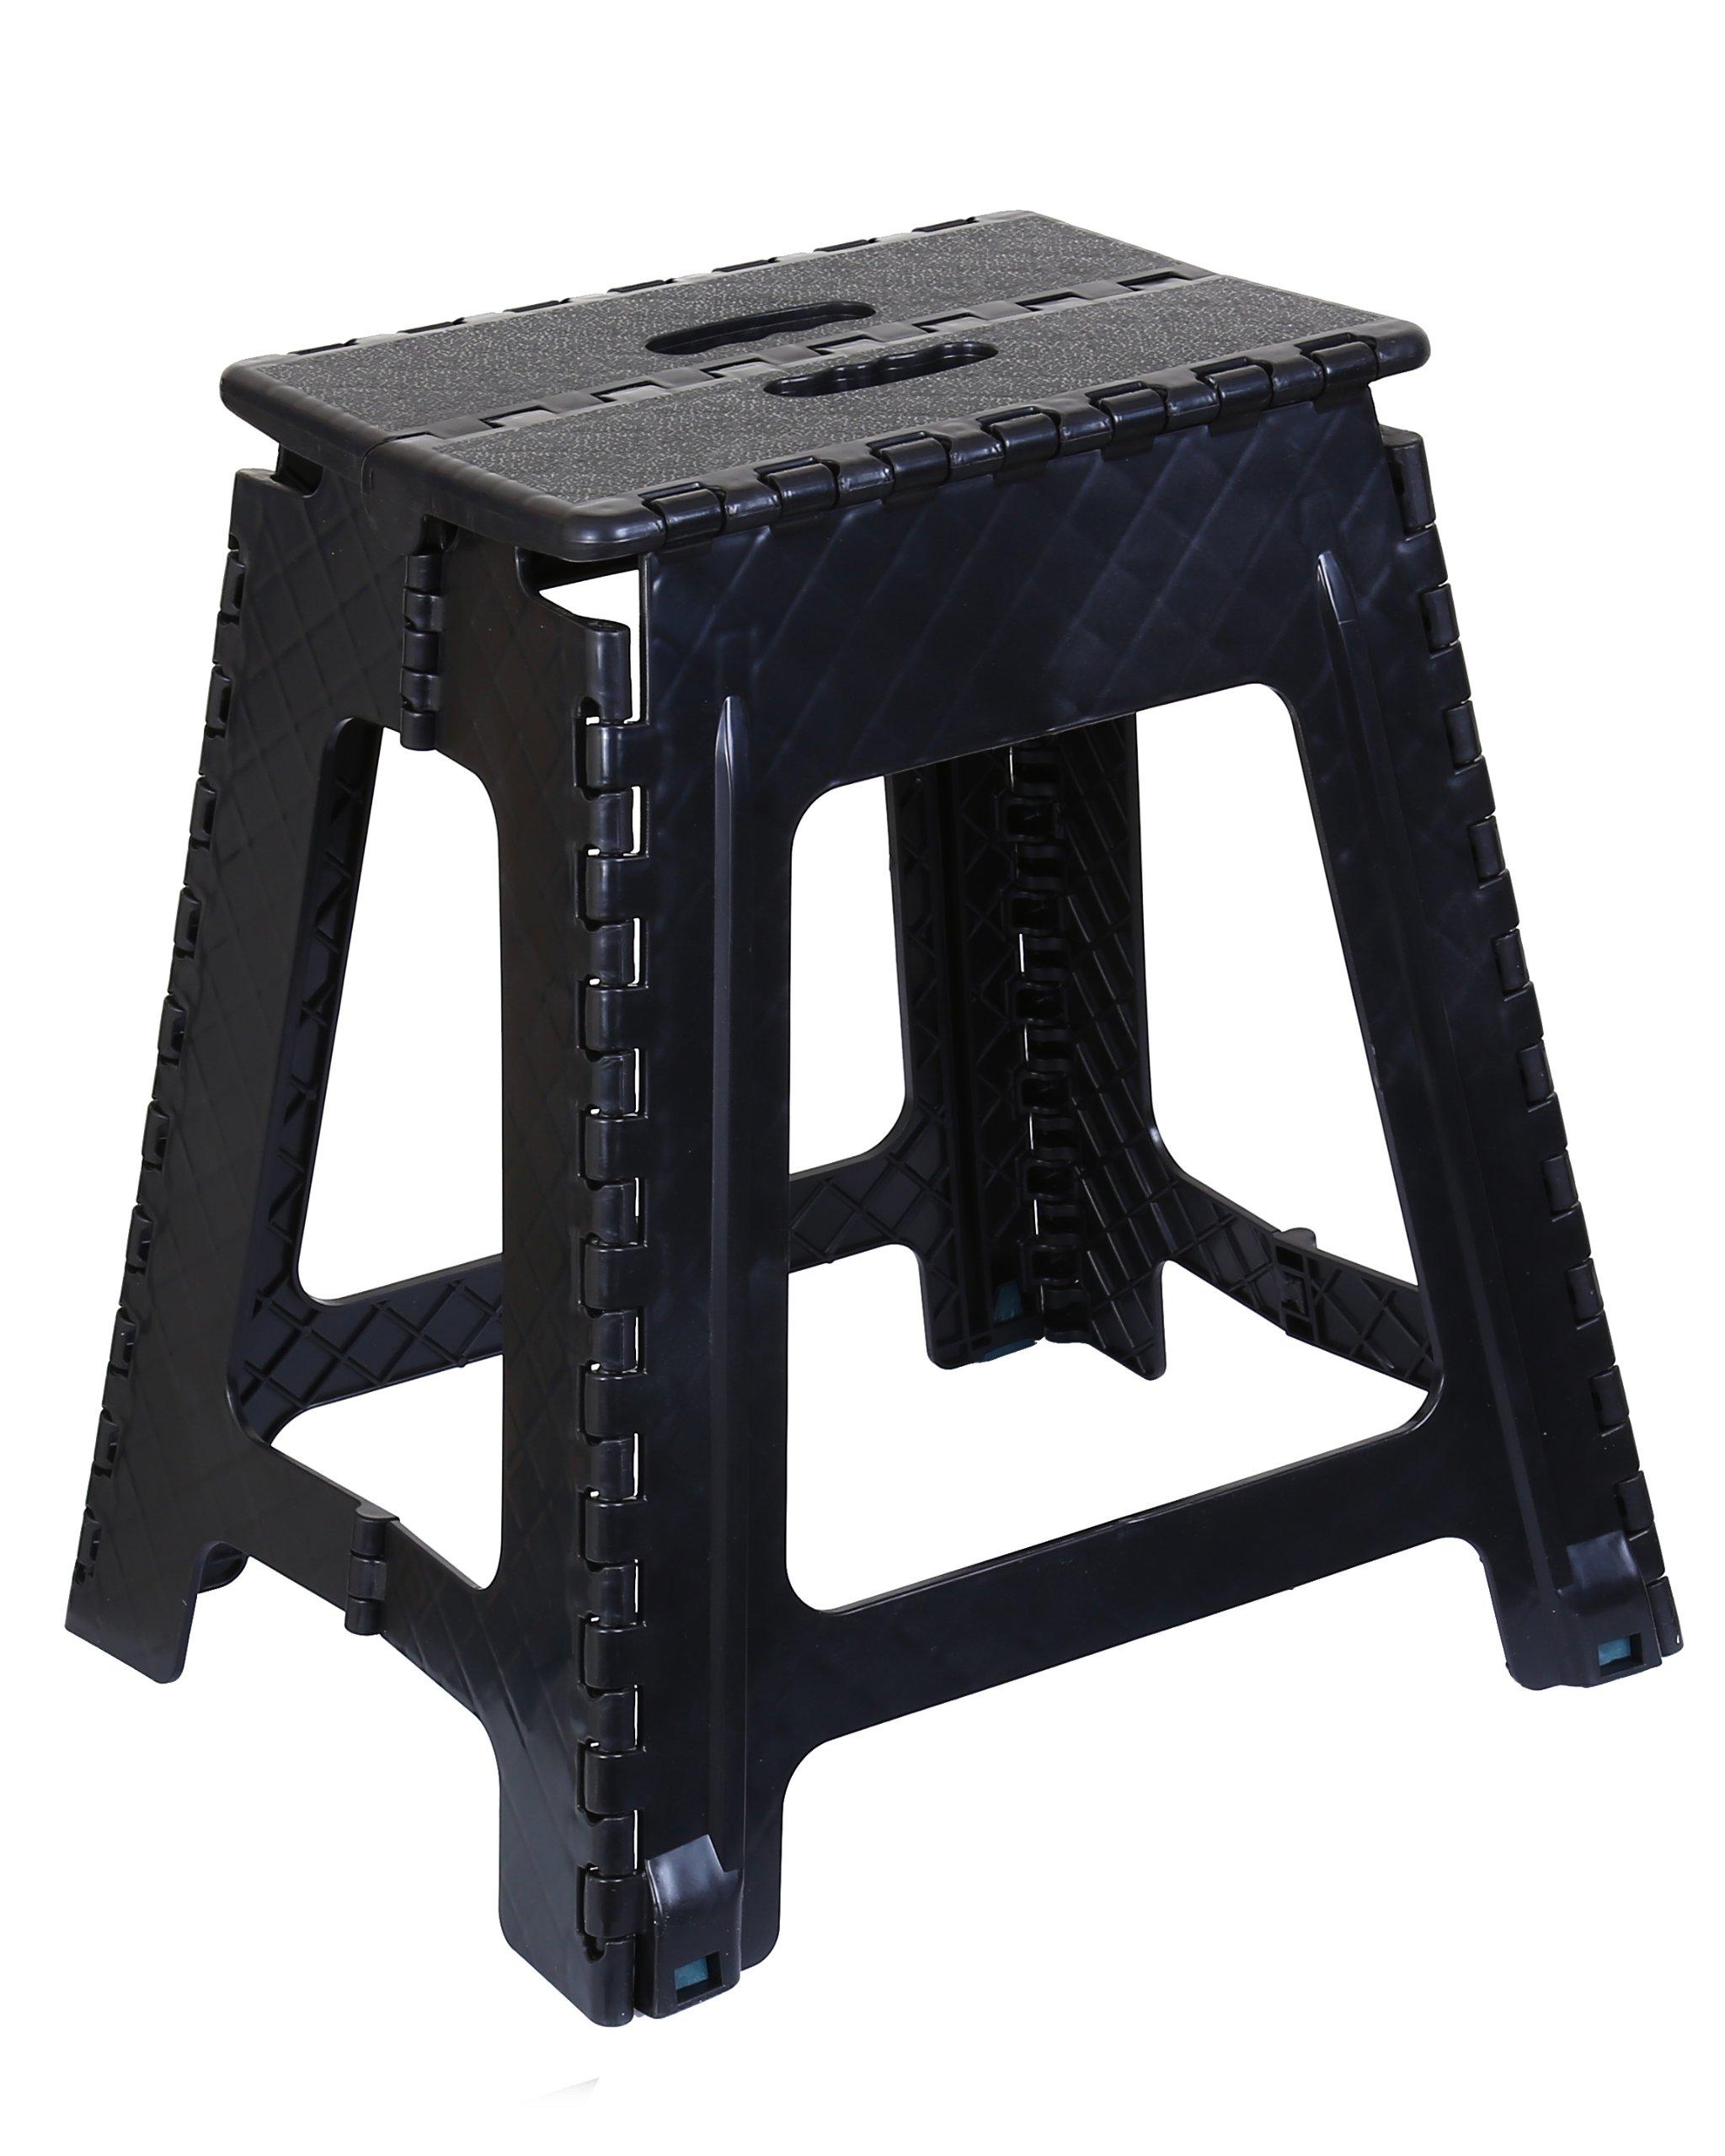 Fabulous Details About Folding Step Stool 18 Inch Black Black Free Shipping Frankydiablos Diy Chair Ideas Frankydiabloscom